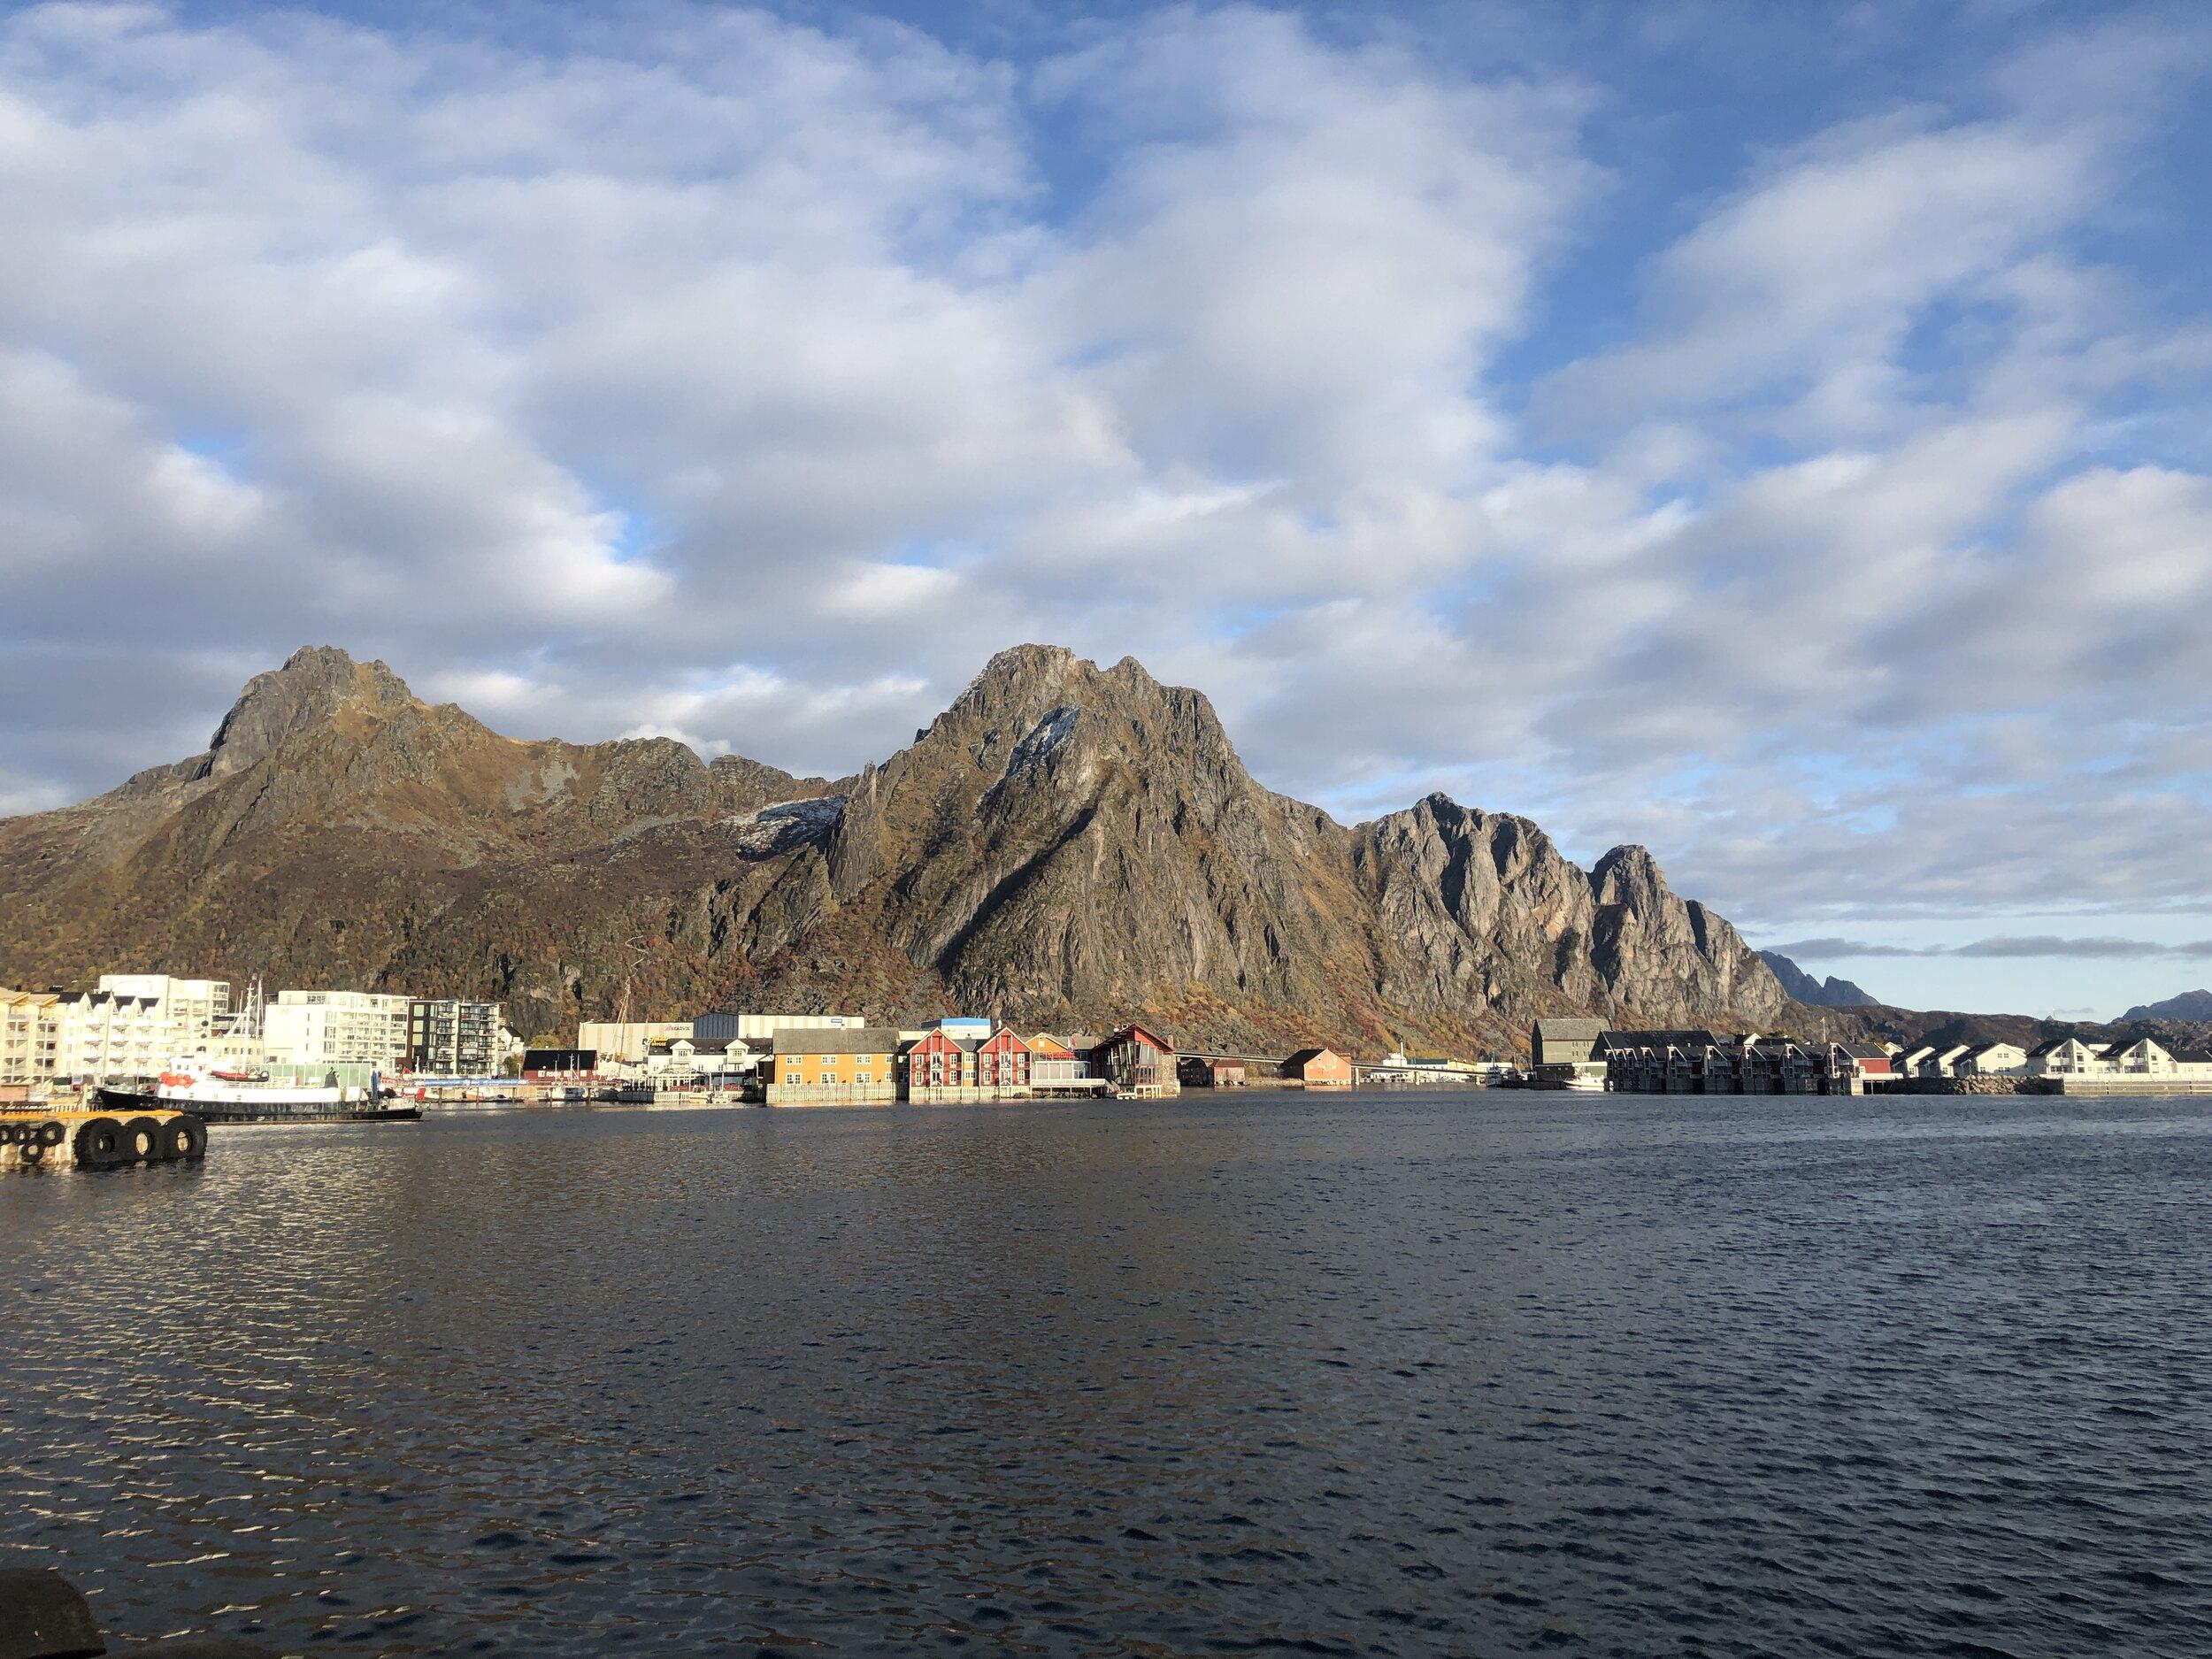 Great views to make work - Norway 2019